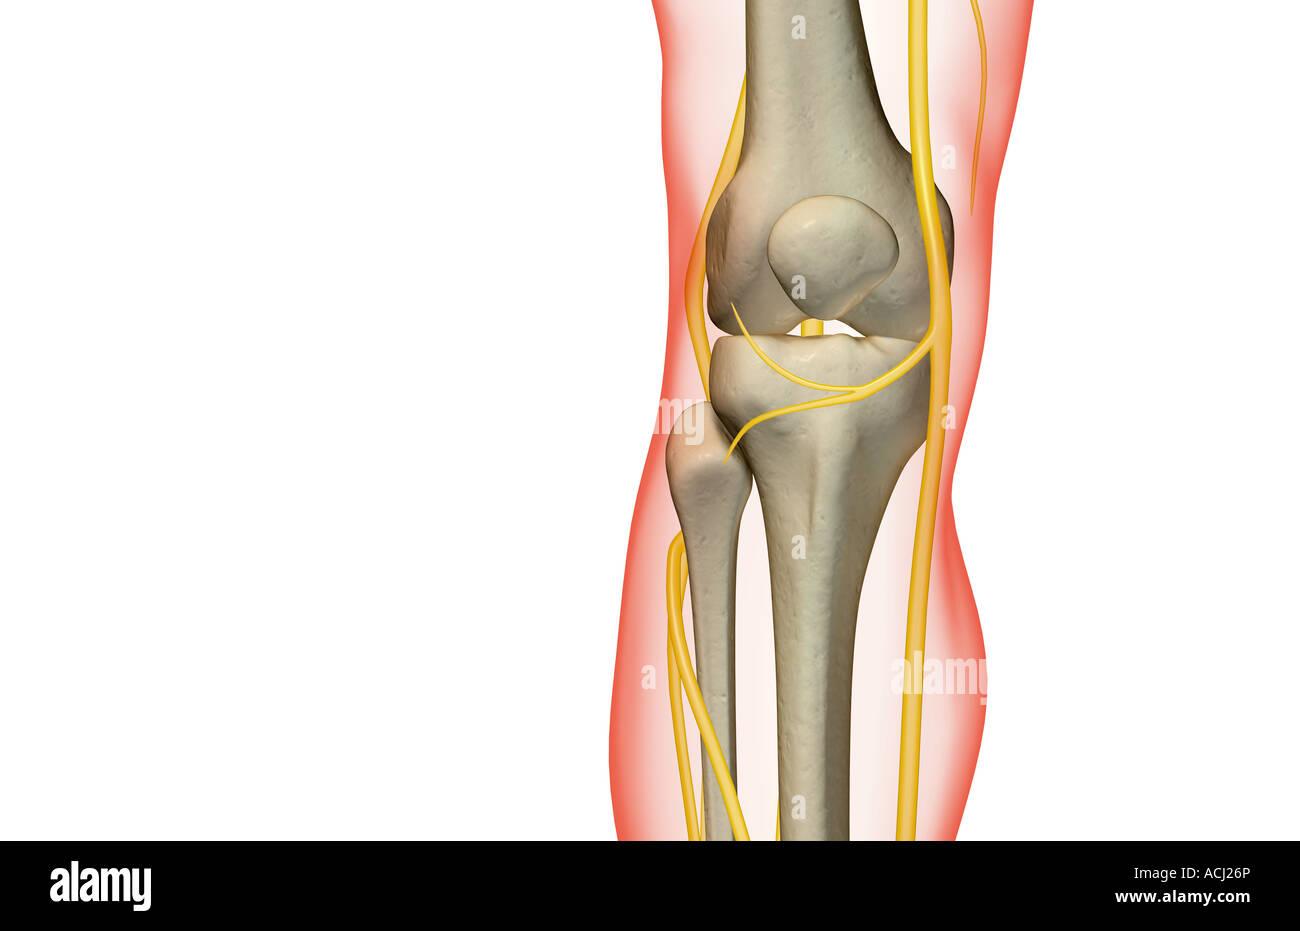 Human Knee Nerves Stock Photos Human Knee Nerves Stock Images Alamy